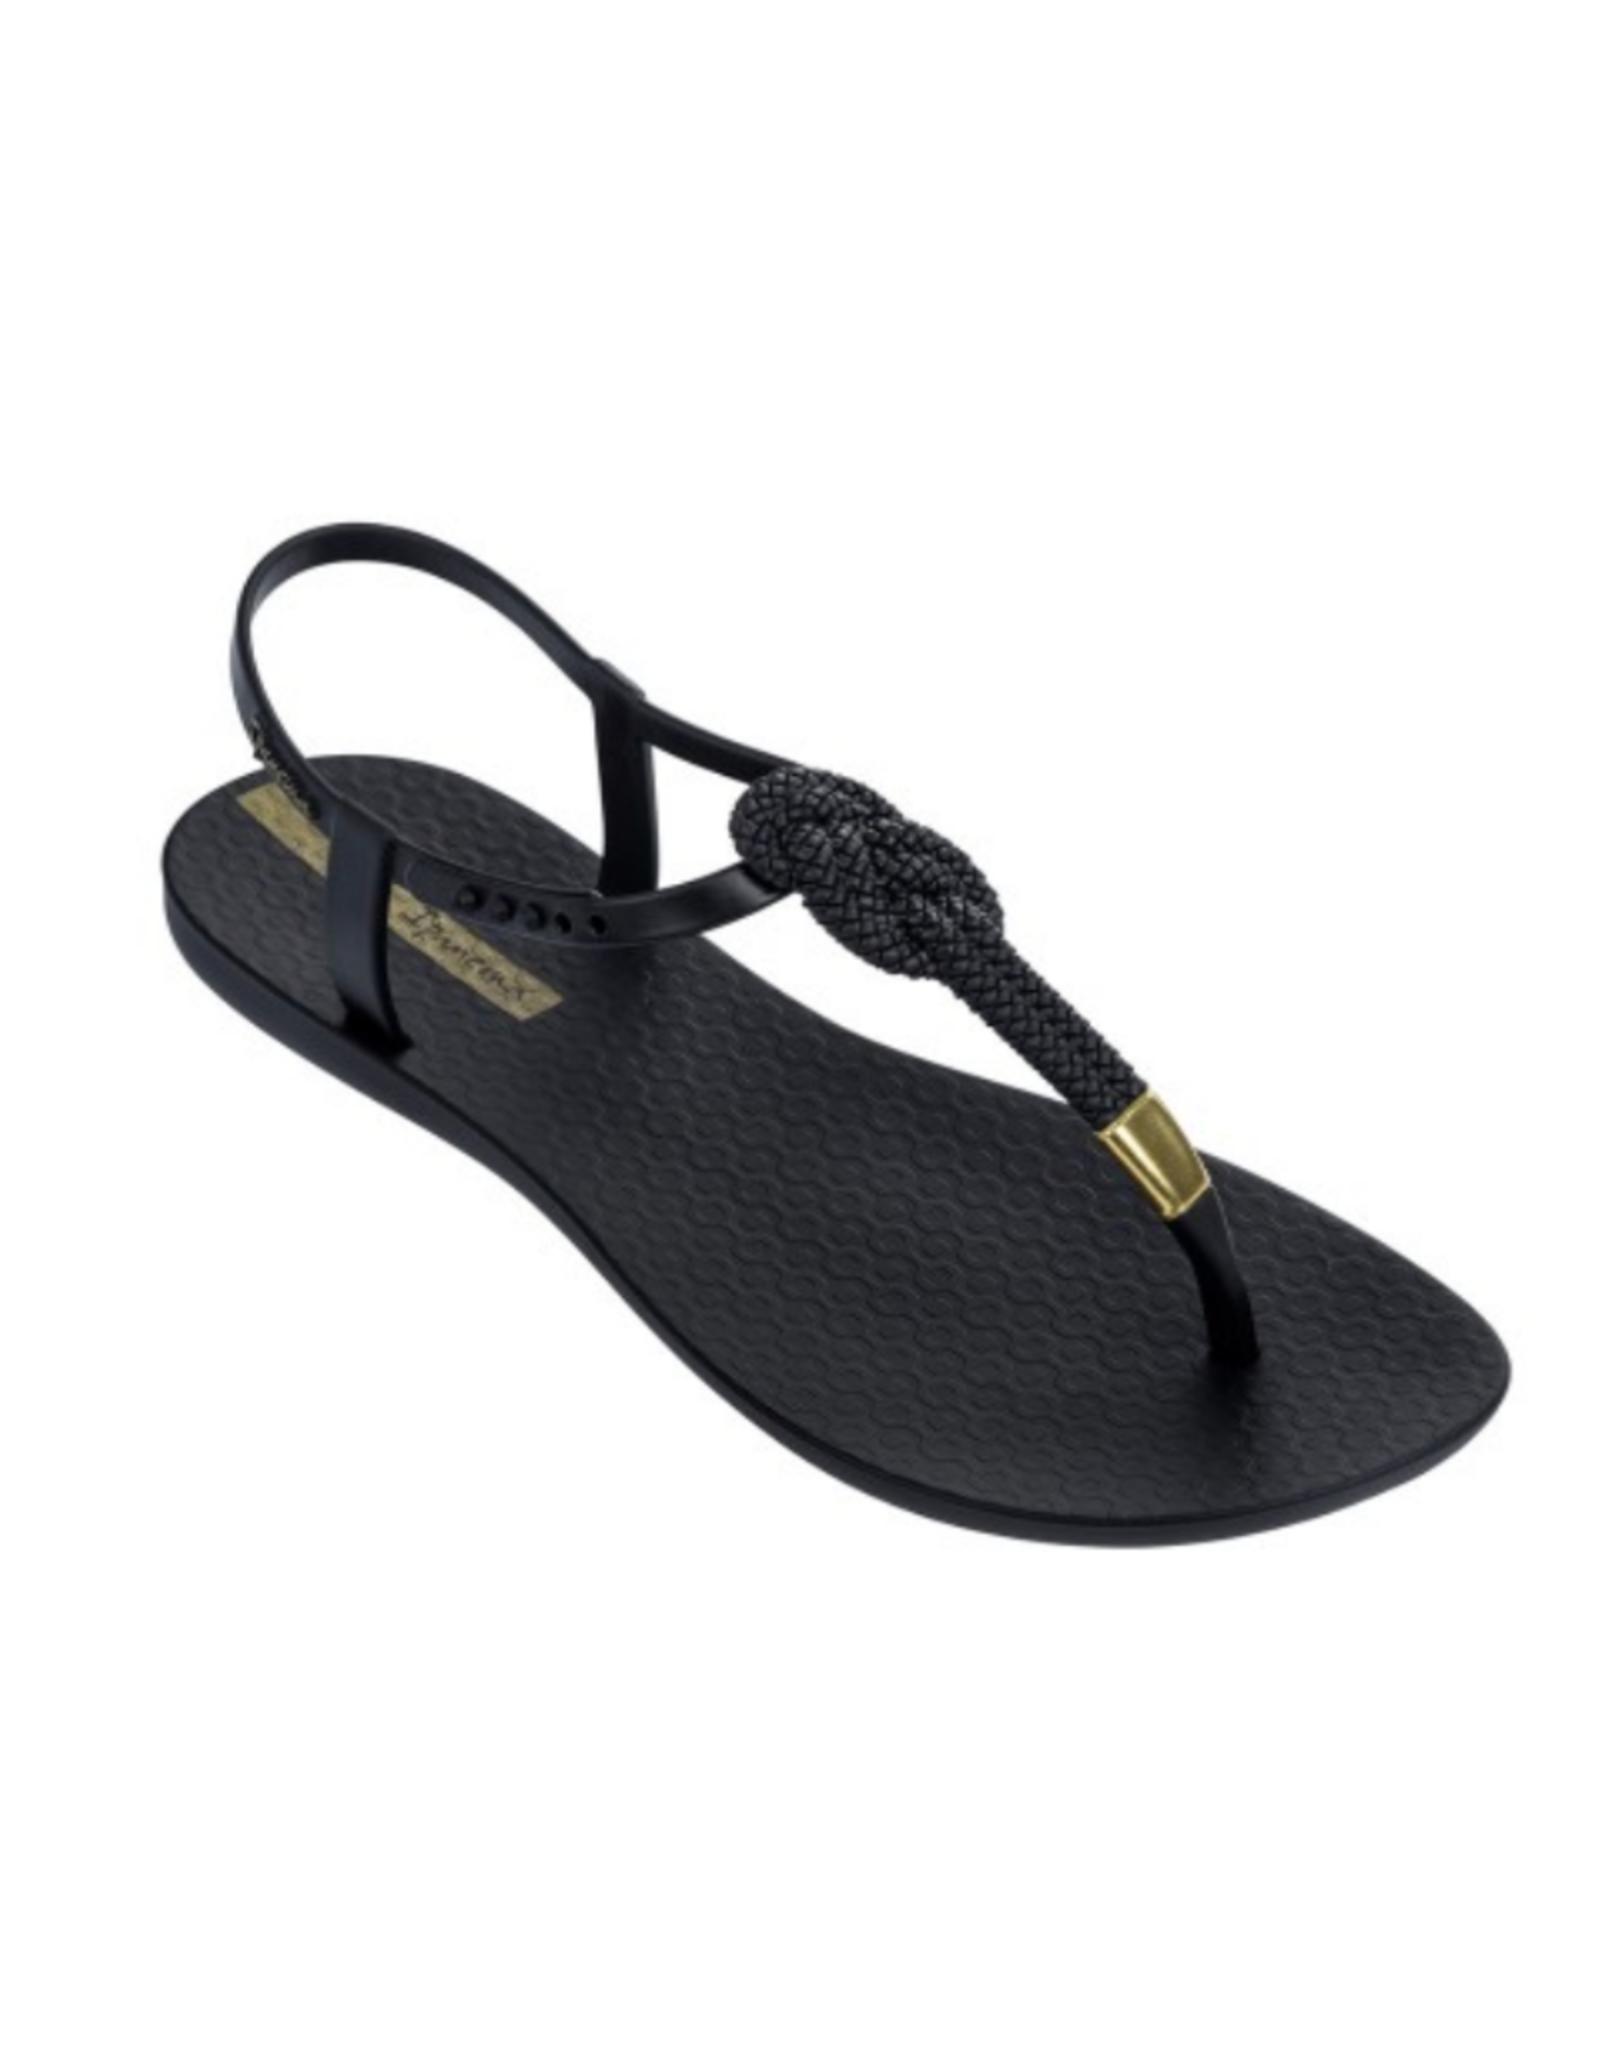 Ipanema Mara sandal